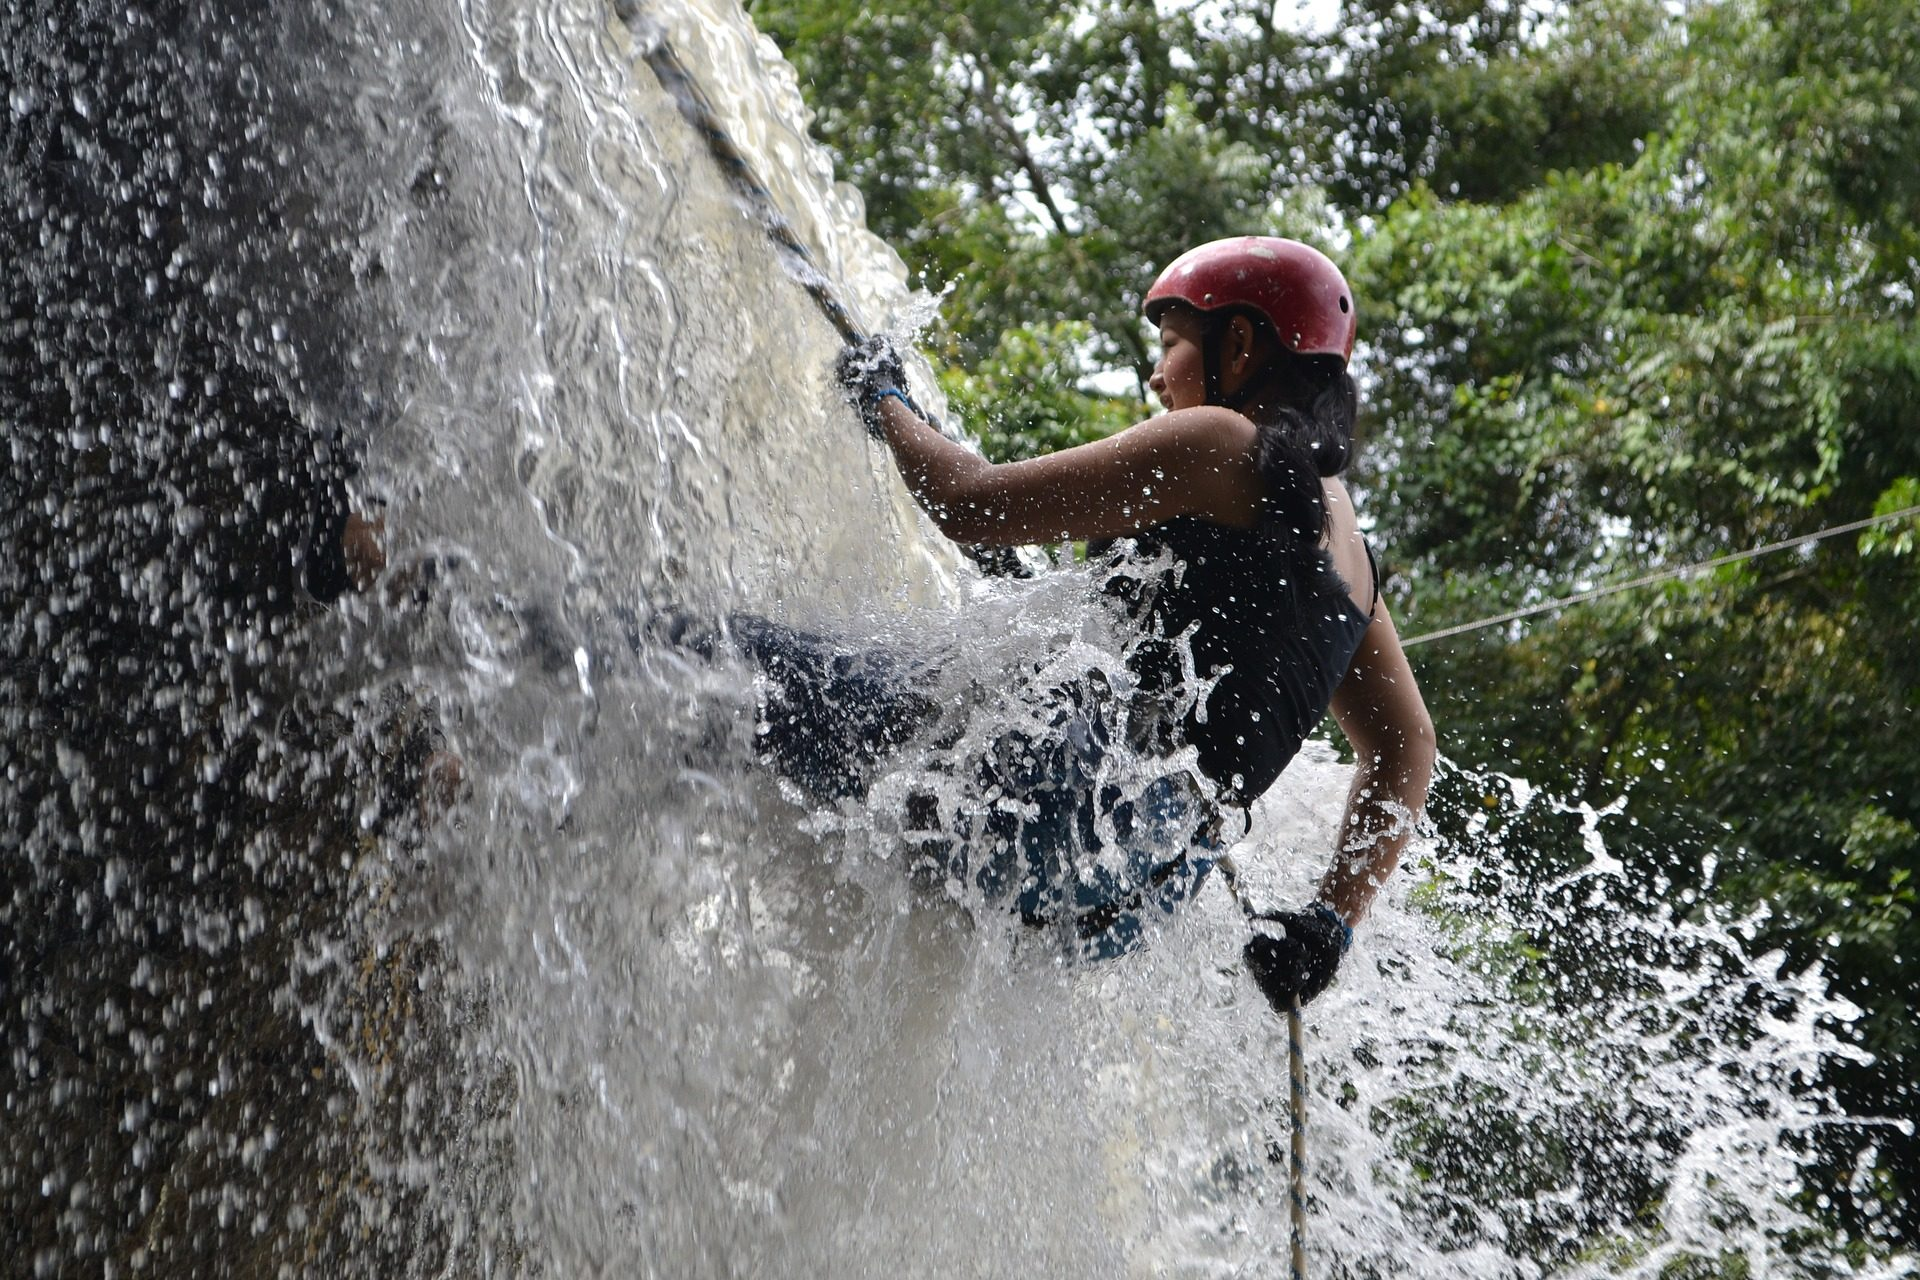 discesa, arrampicata, Cascate, acqua, Fiume, rischio - Sfondi HD - Professor-falken.com